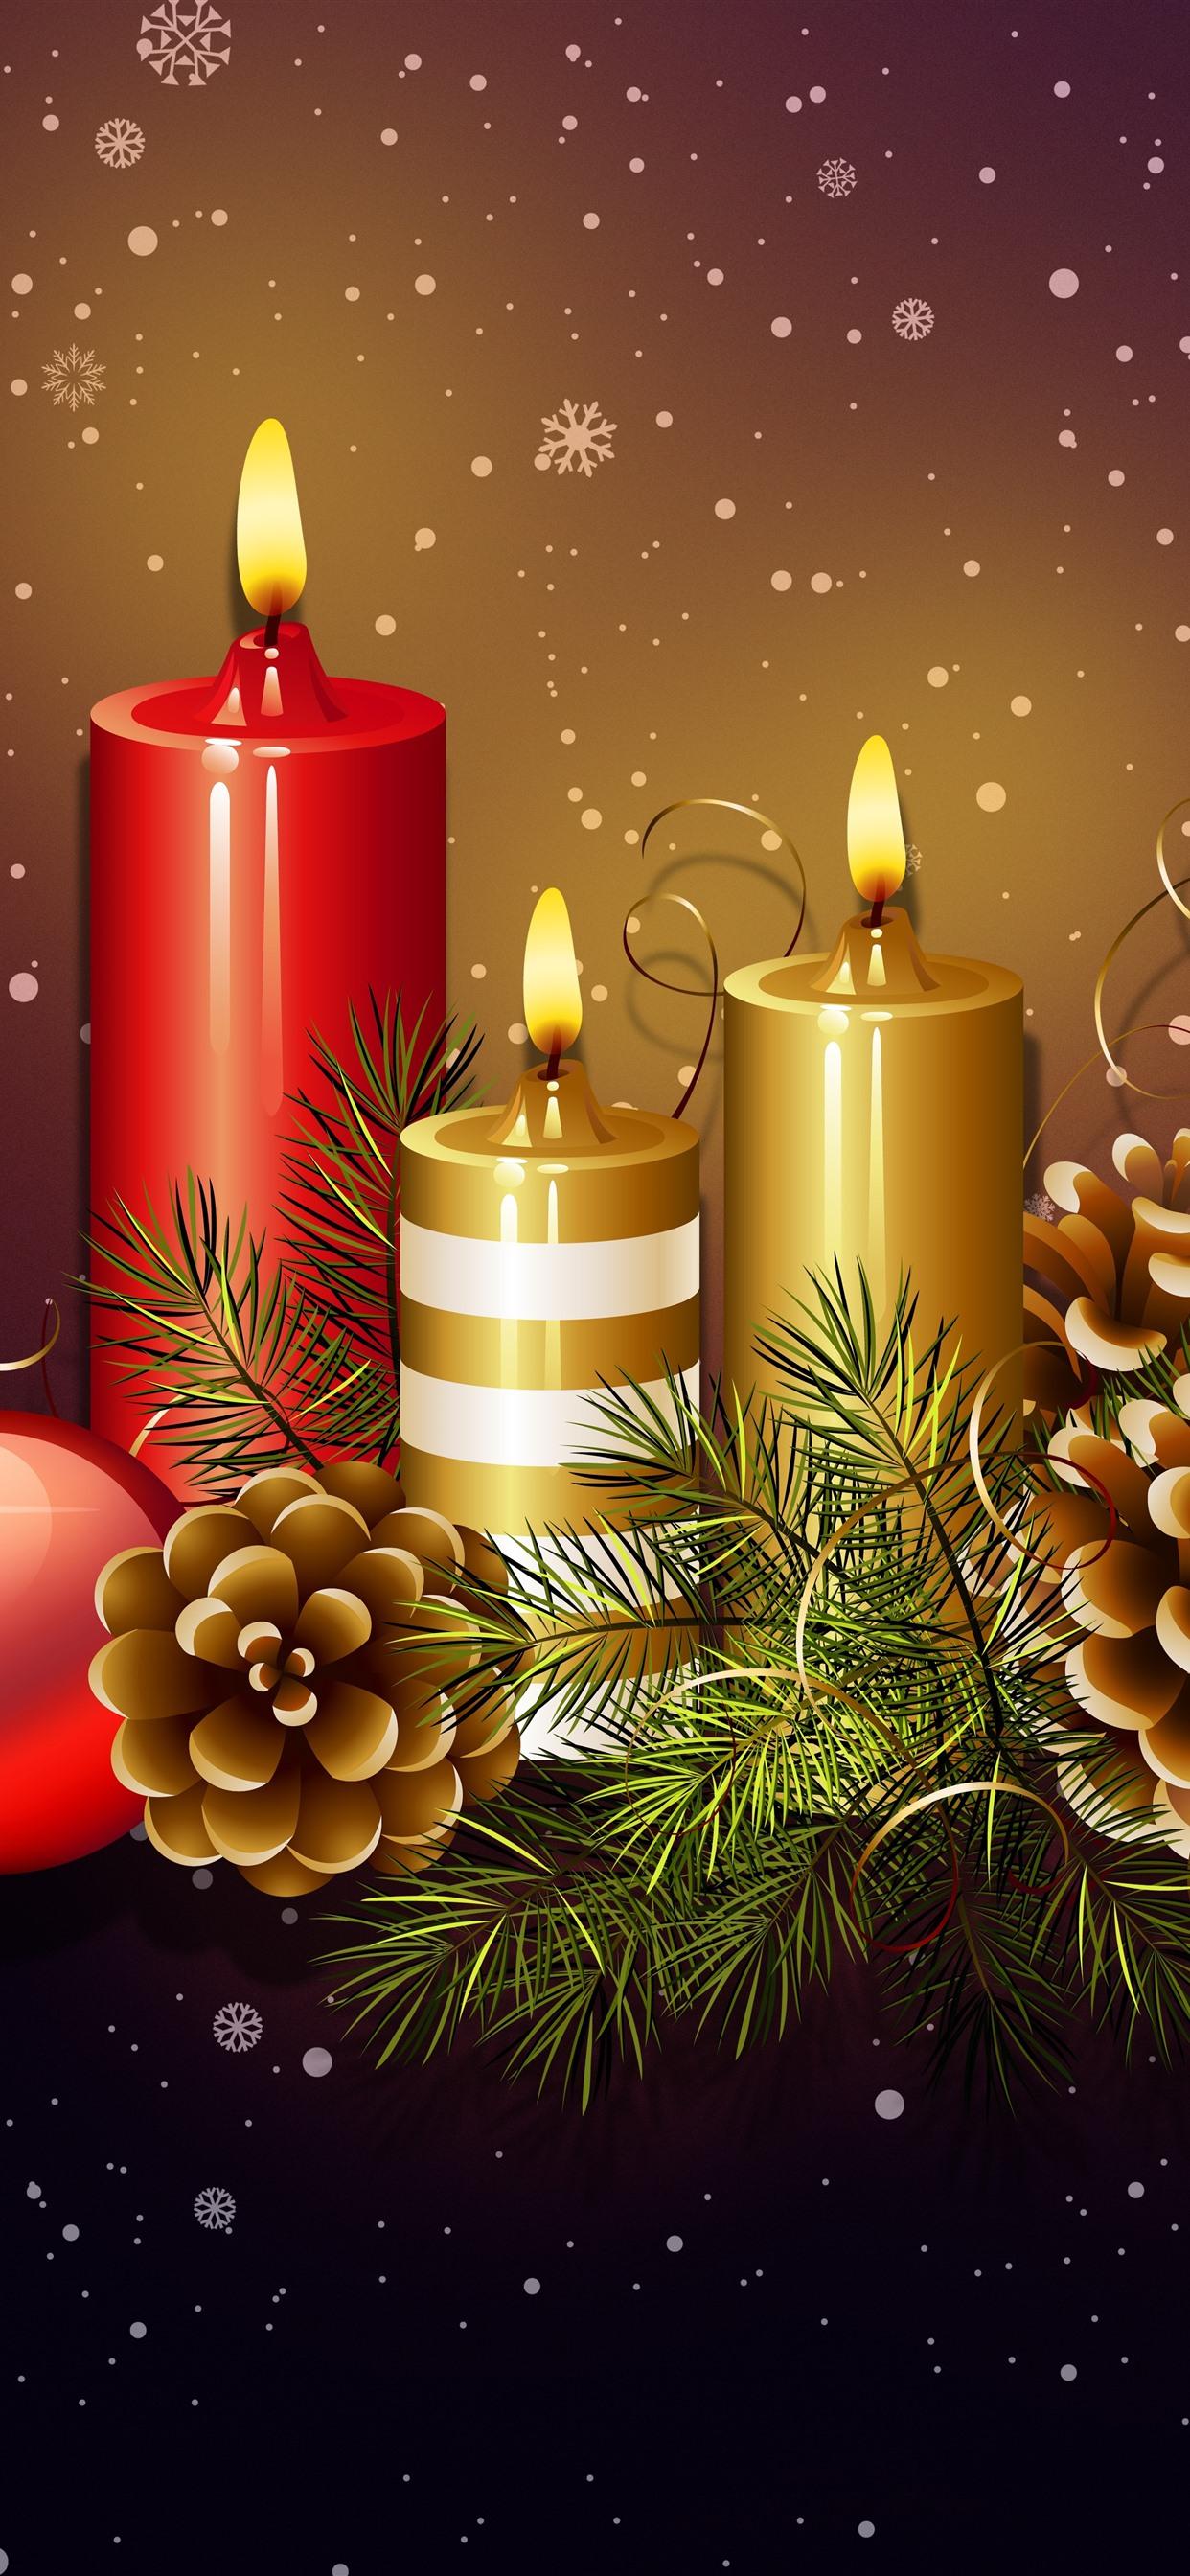 Candles Flame Christmas Balls Decoration Snowflakes Art